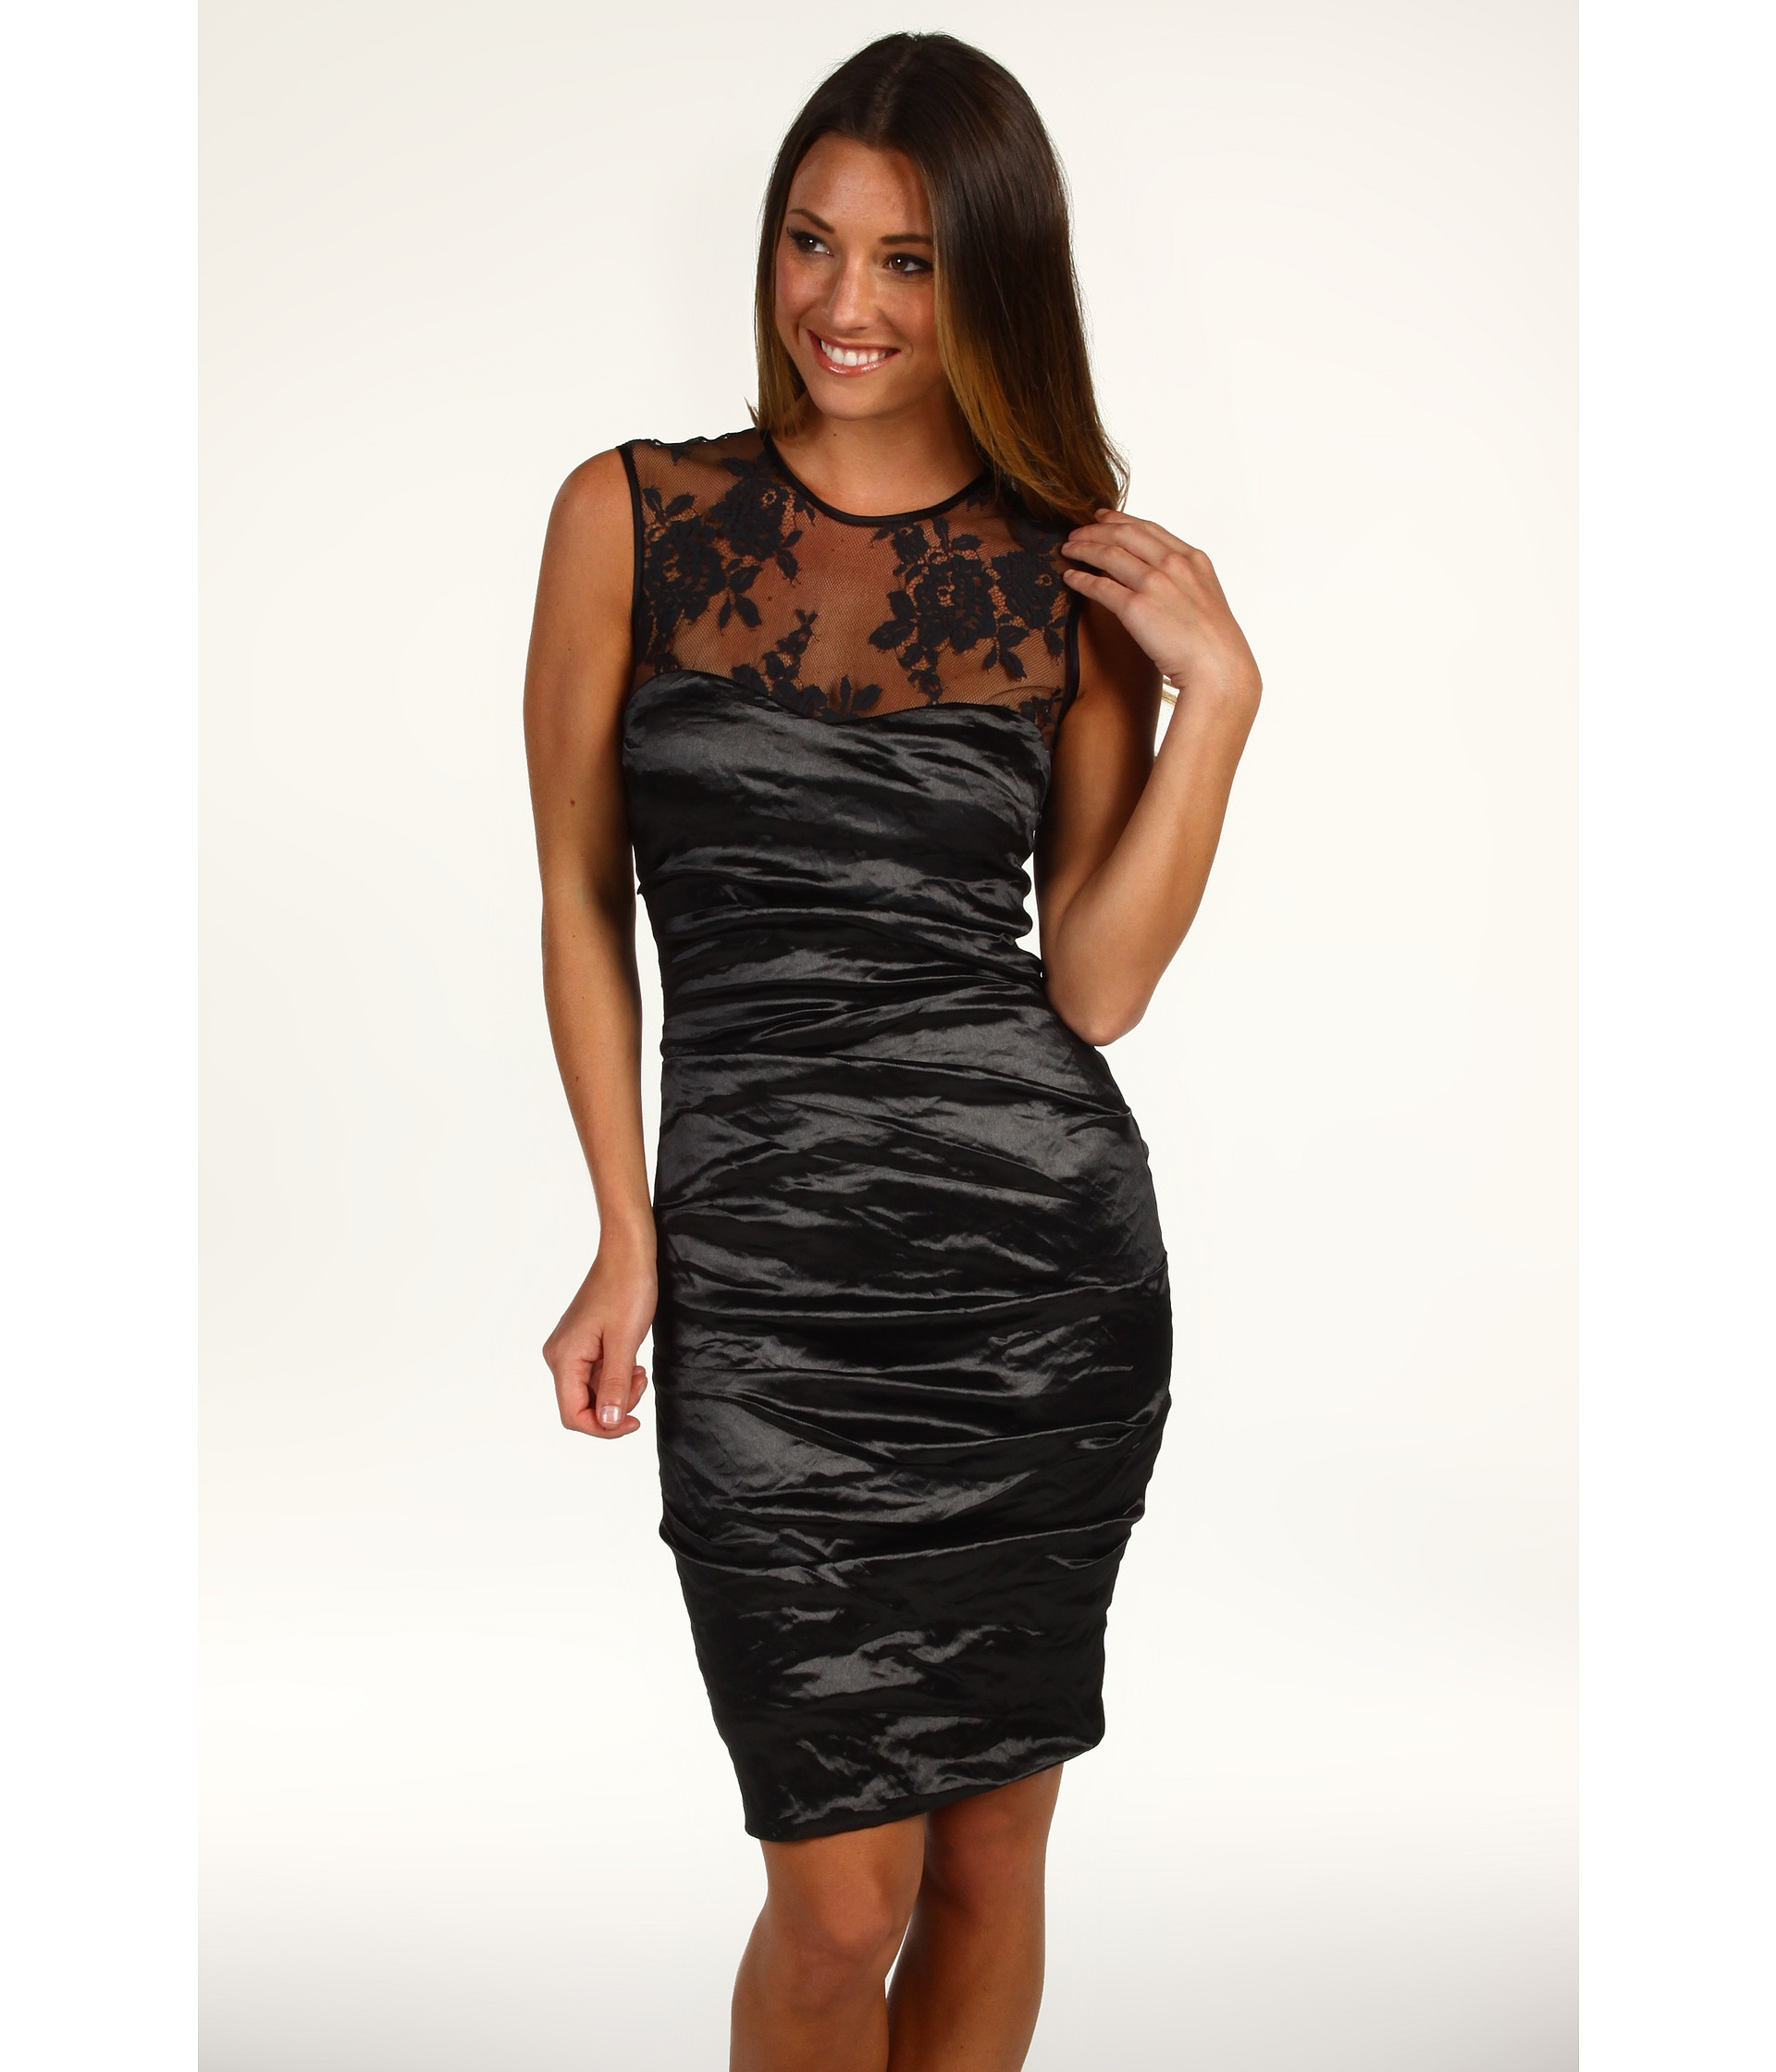 Nicole Miller Techno Metal & Lace Dress $139.99 (  MSRP $465